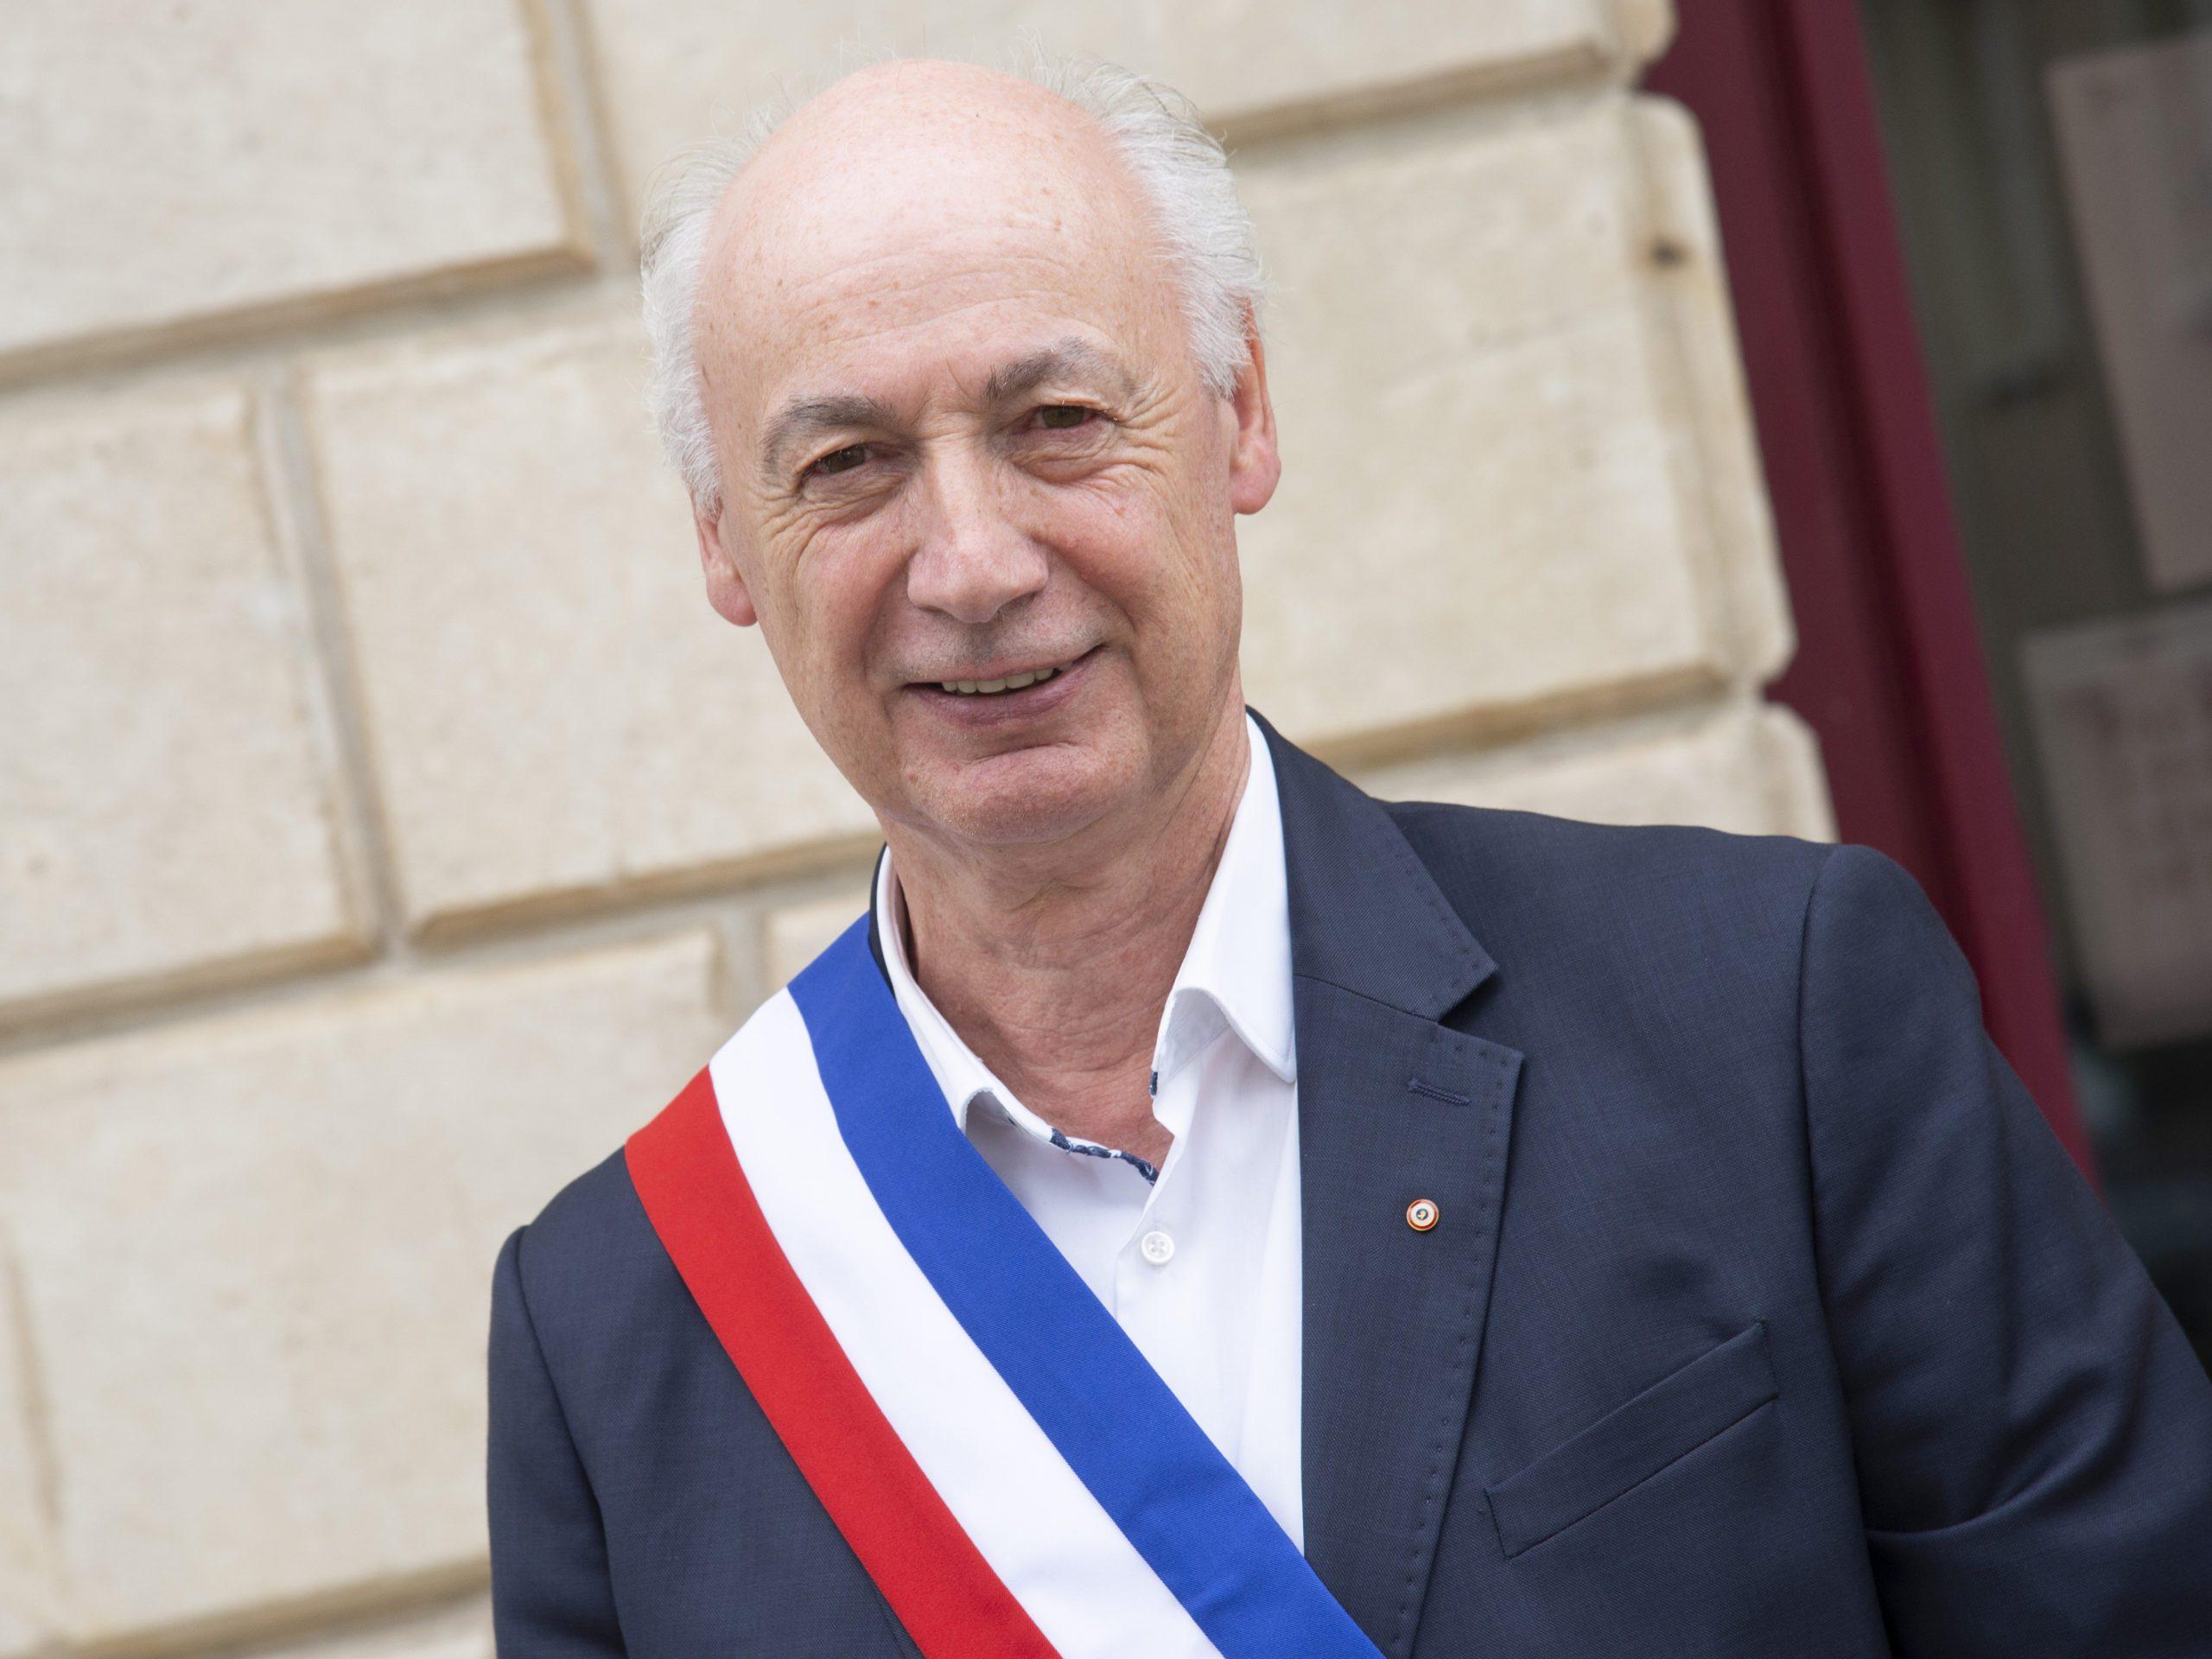 Alain Capelle